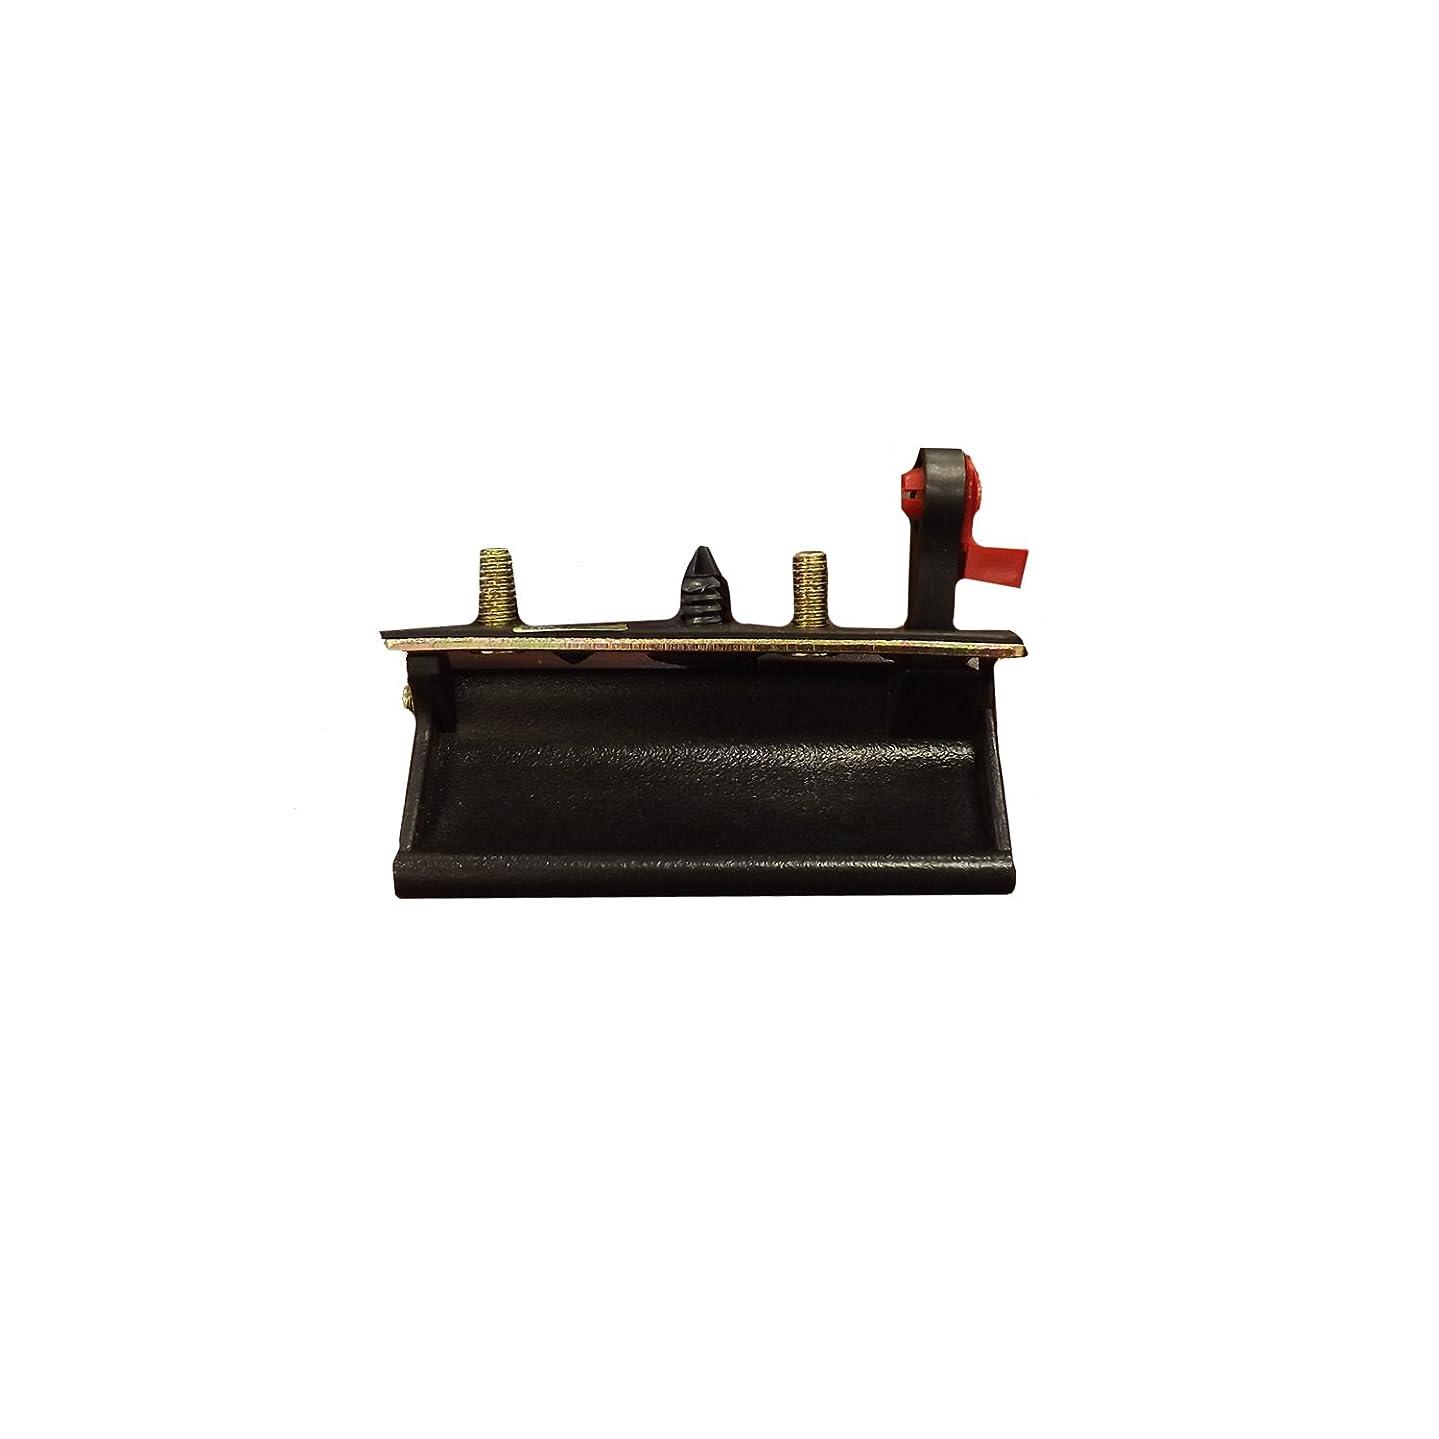 Needa Parts 824282 Tailgate Handle